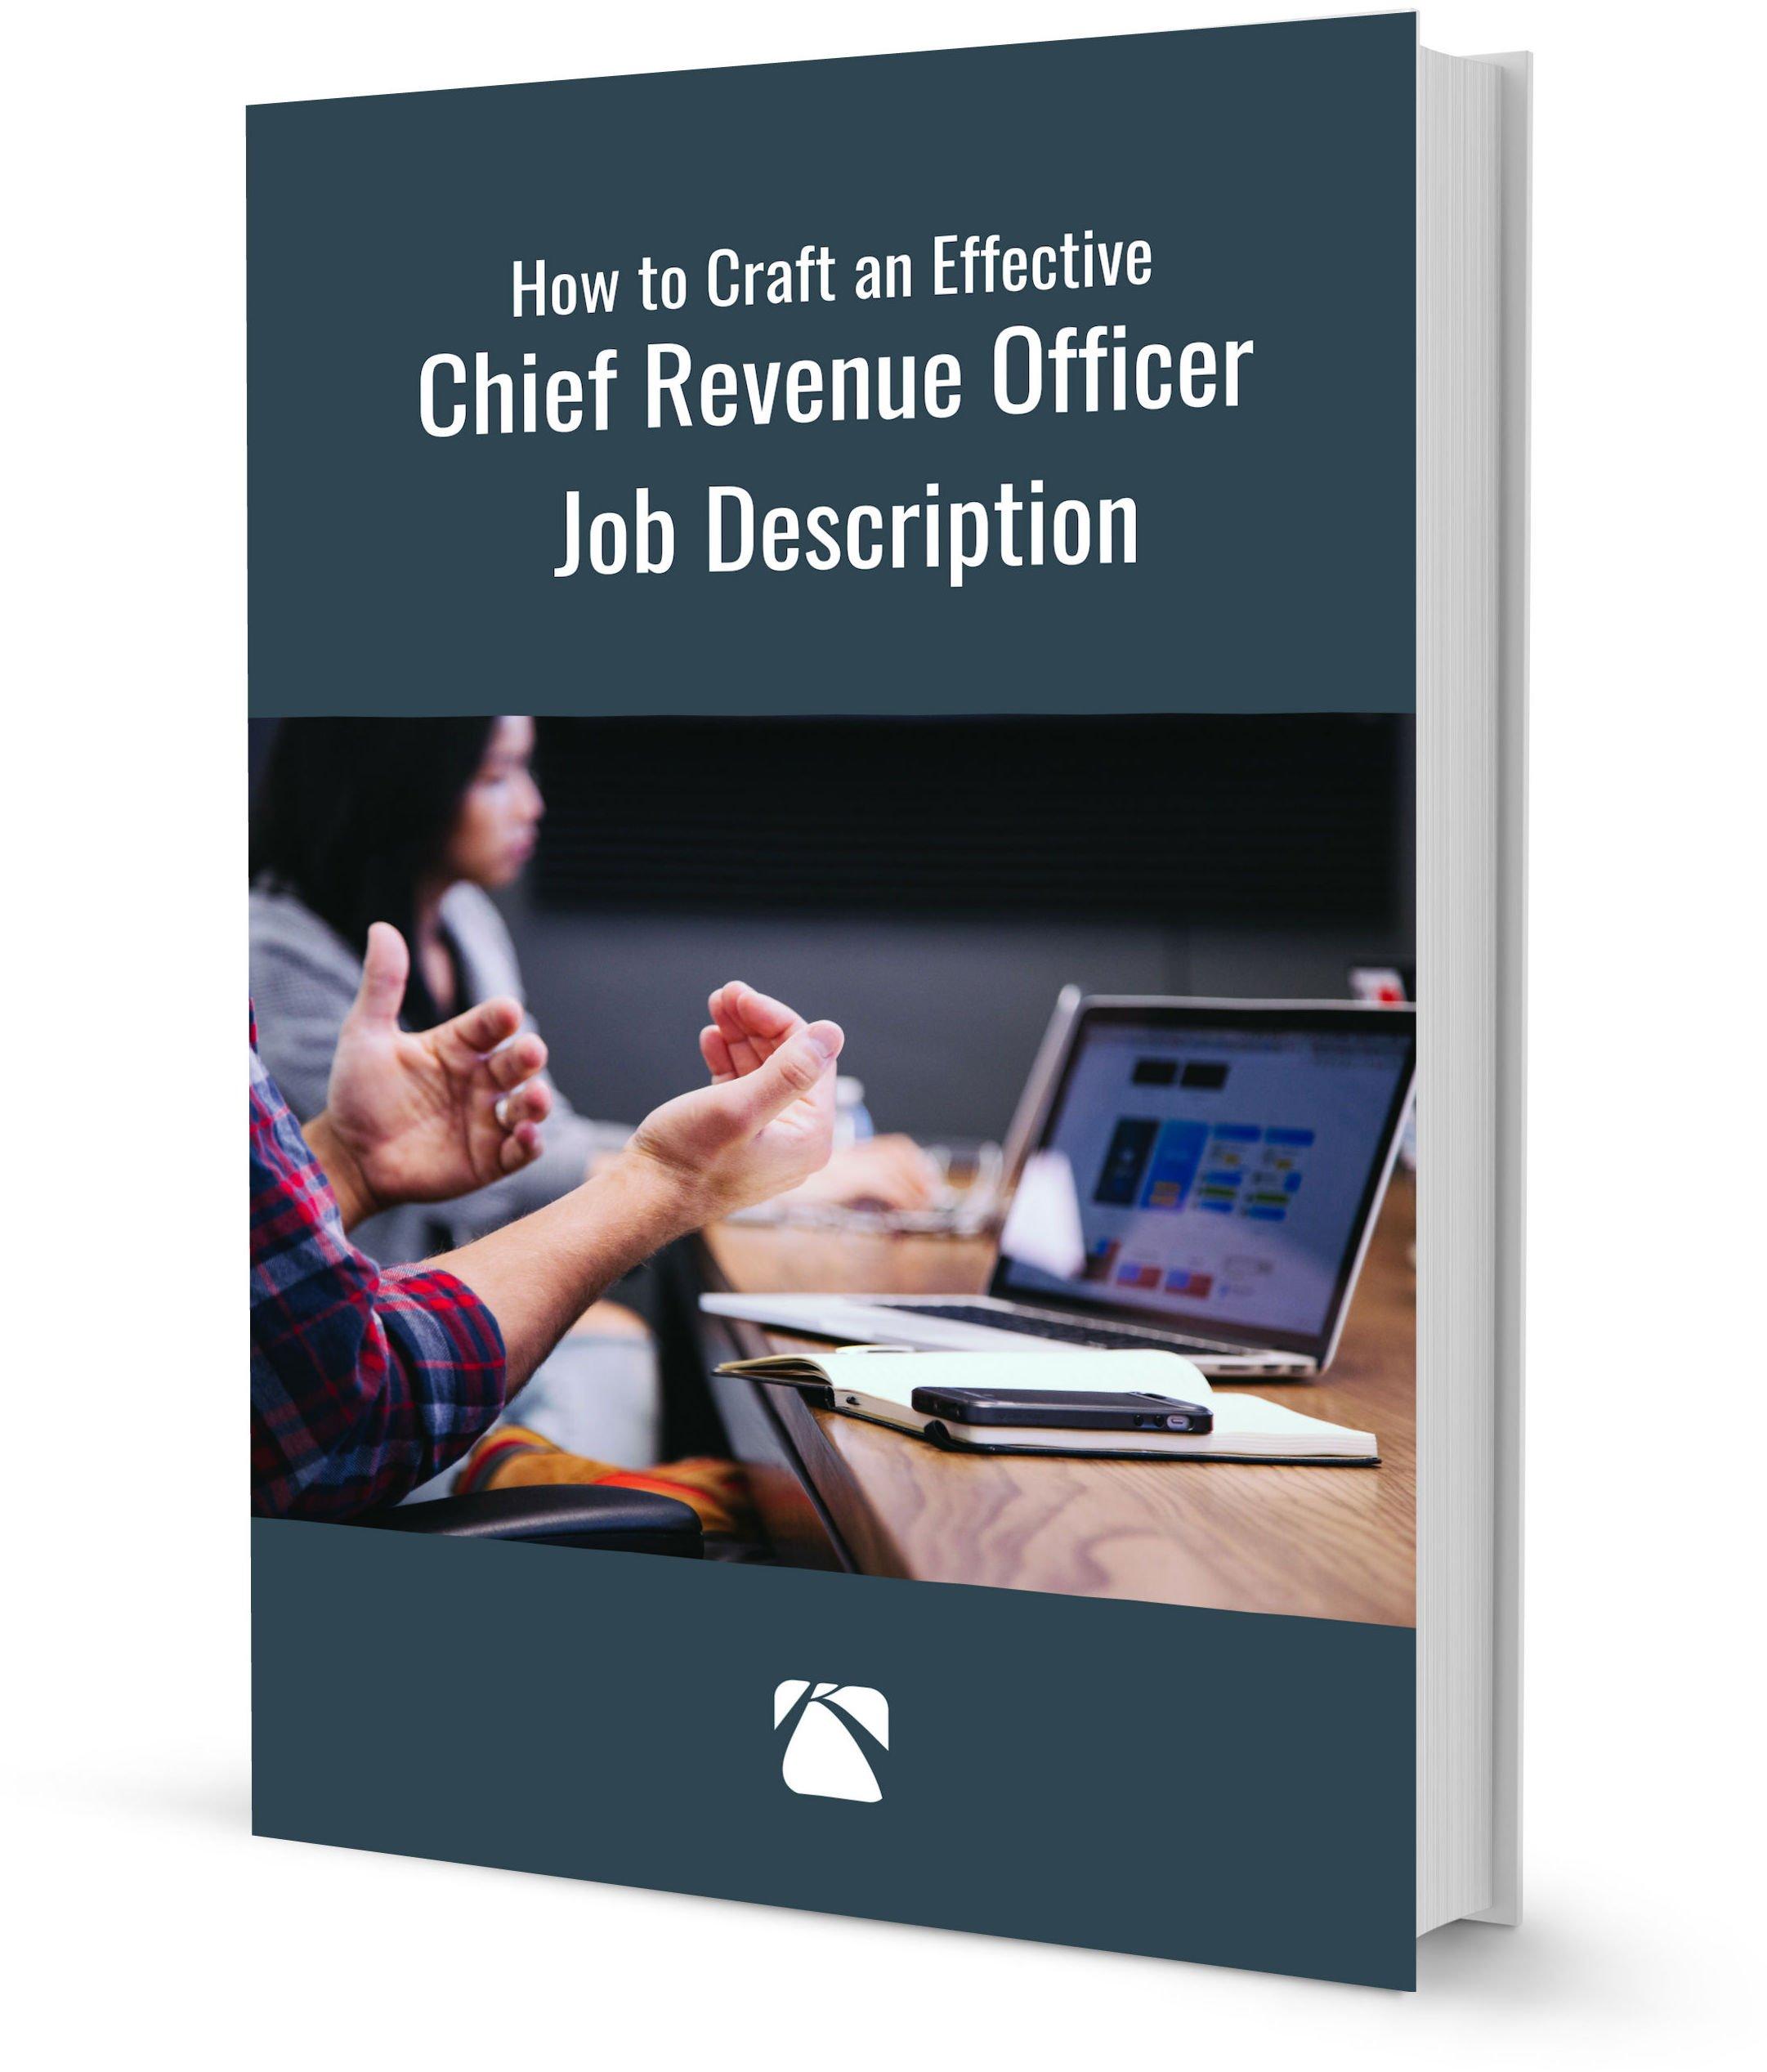 Chief Revenue Officer Job Description